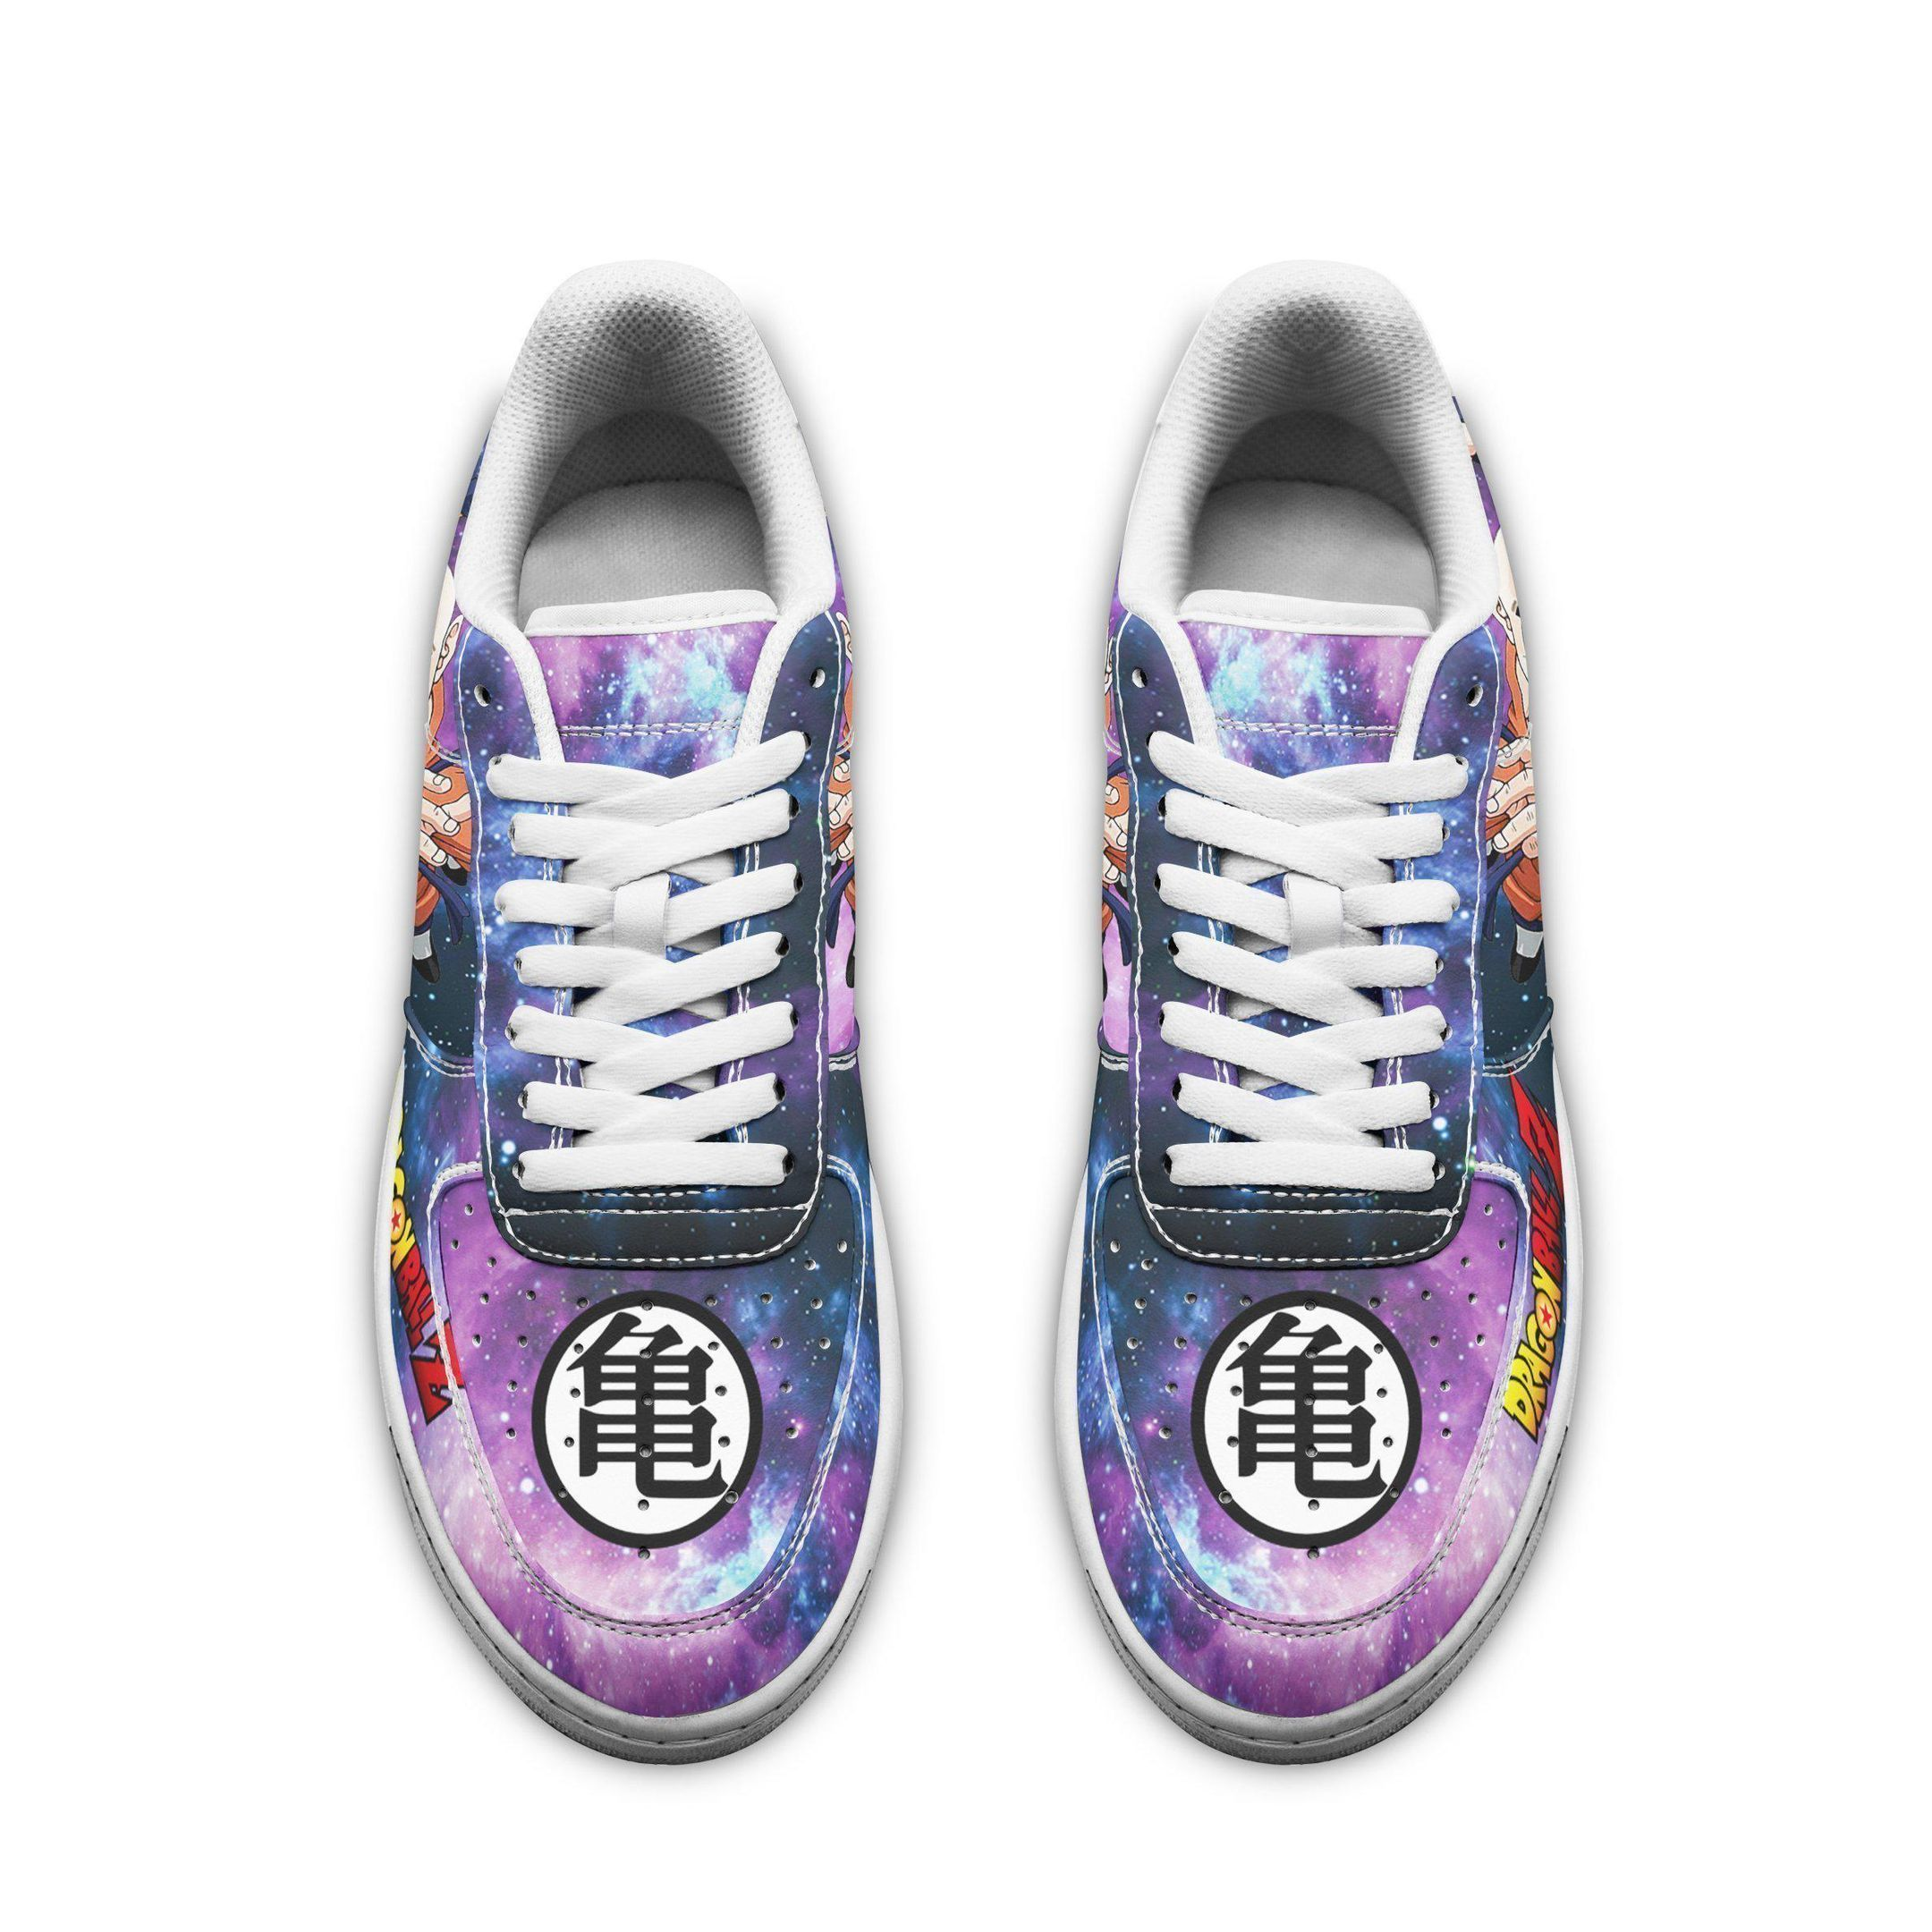 Krillin Air Shoes Dragon Ball Z Anime Shoes Fan Gift GO1012